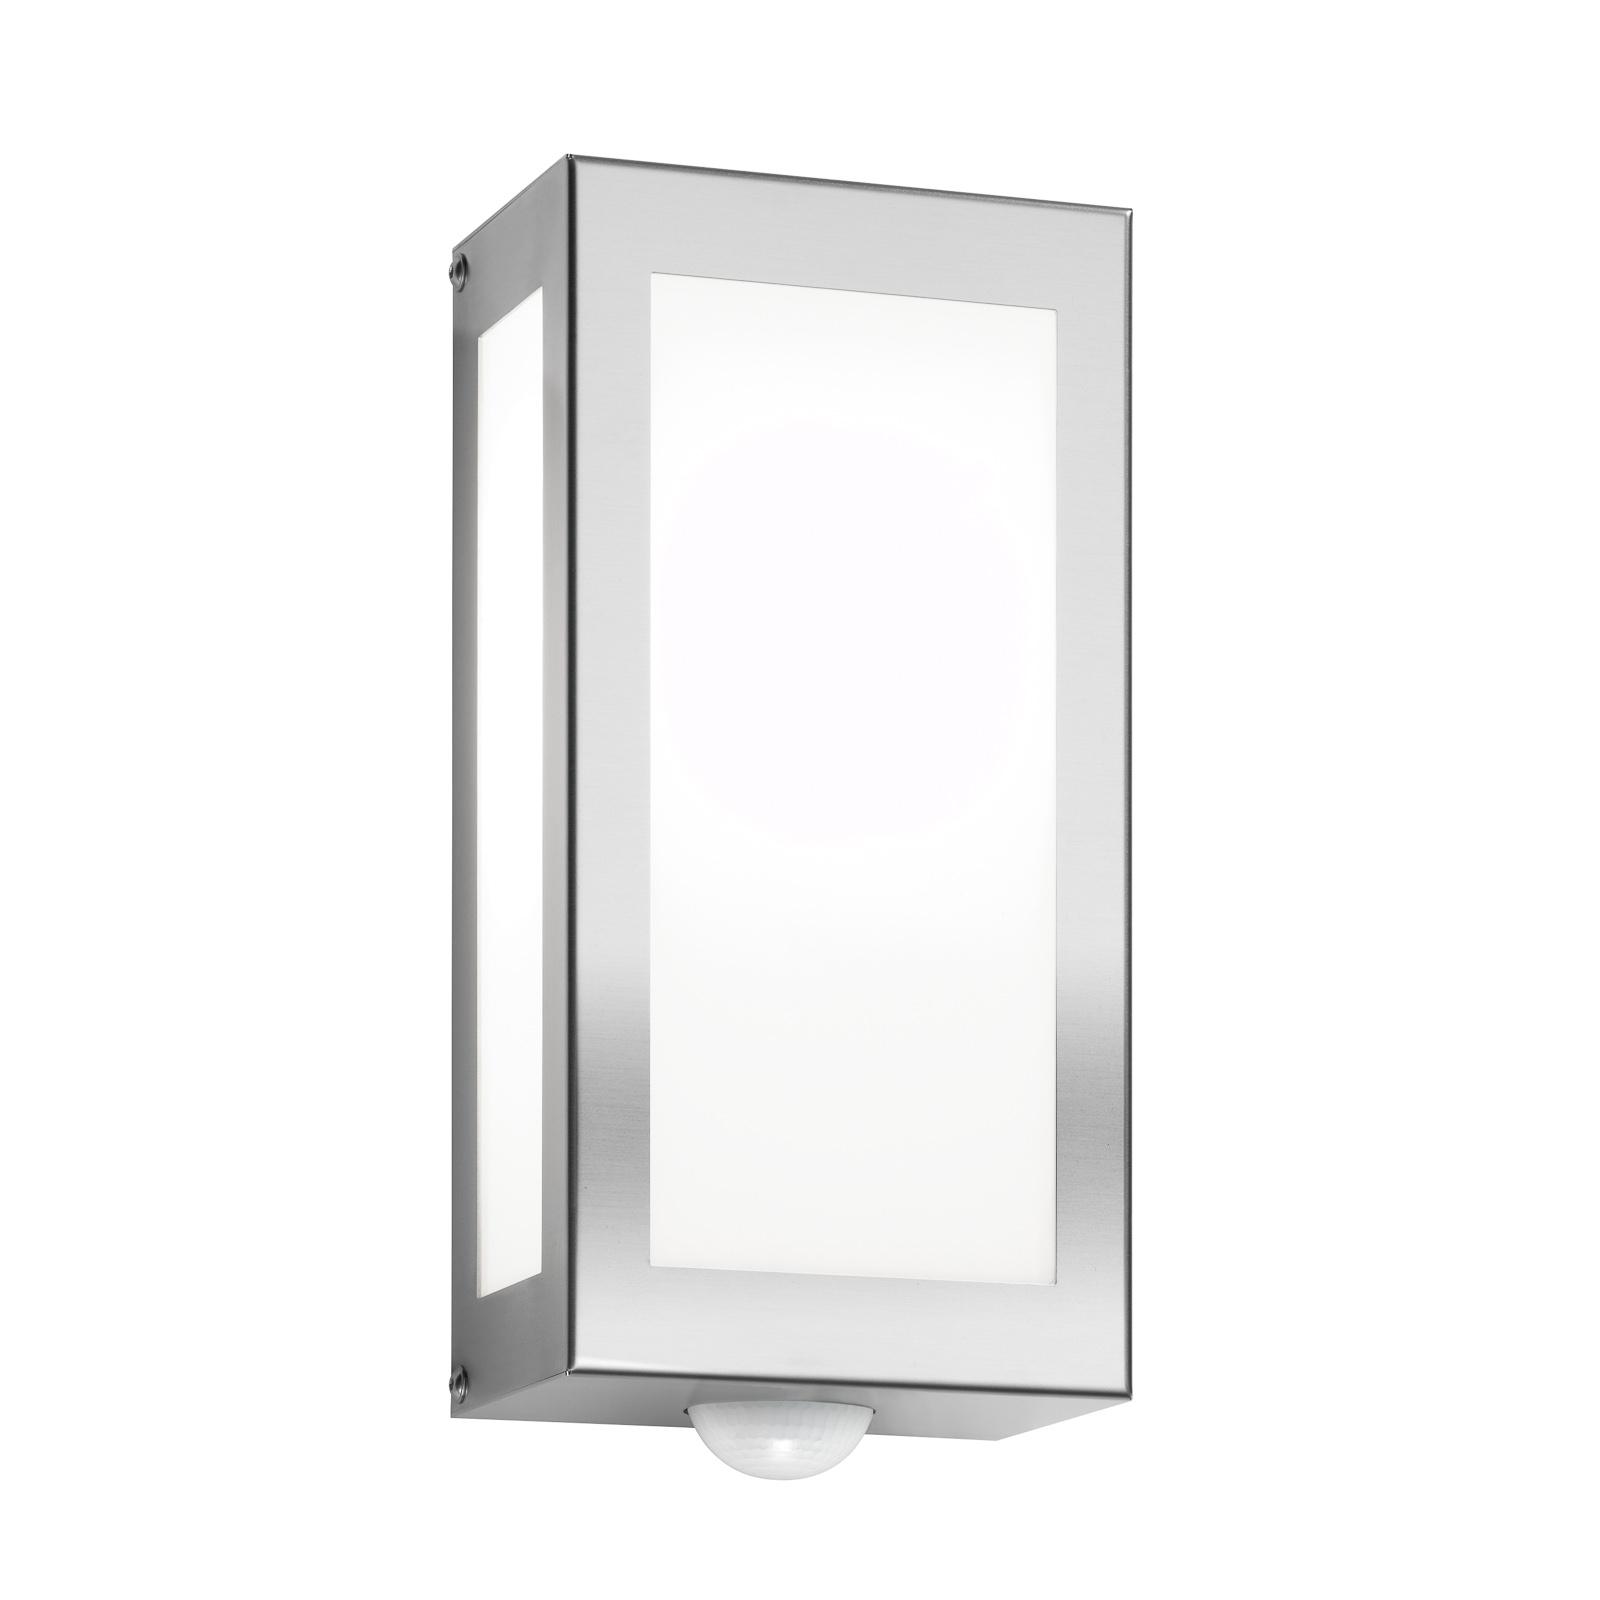 Utevegglampe Aqua Rain, rustfritt stål, sensor